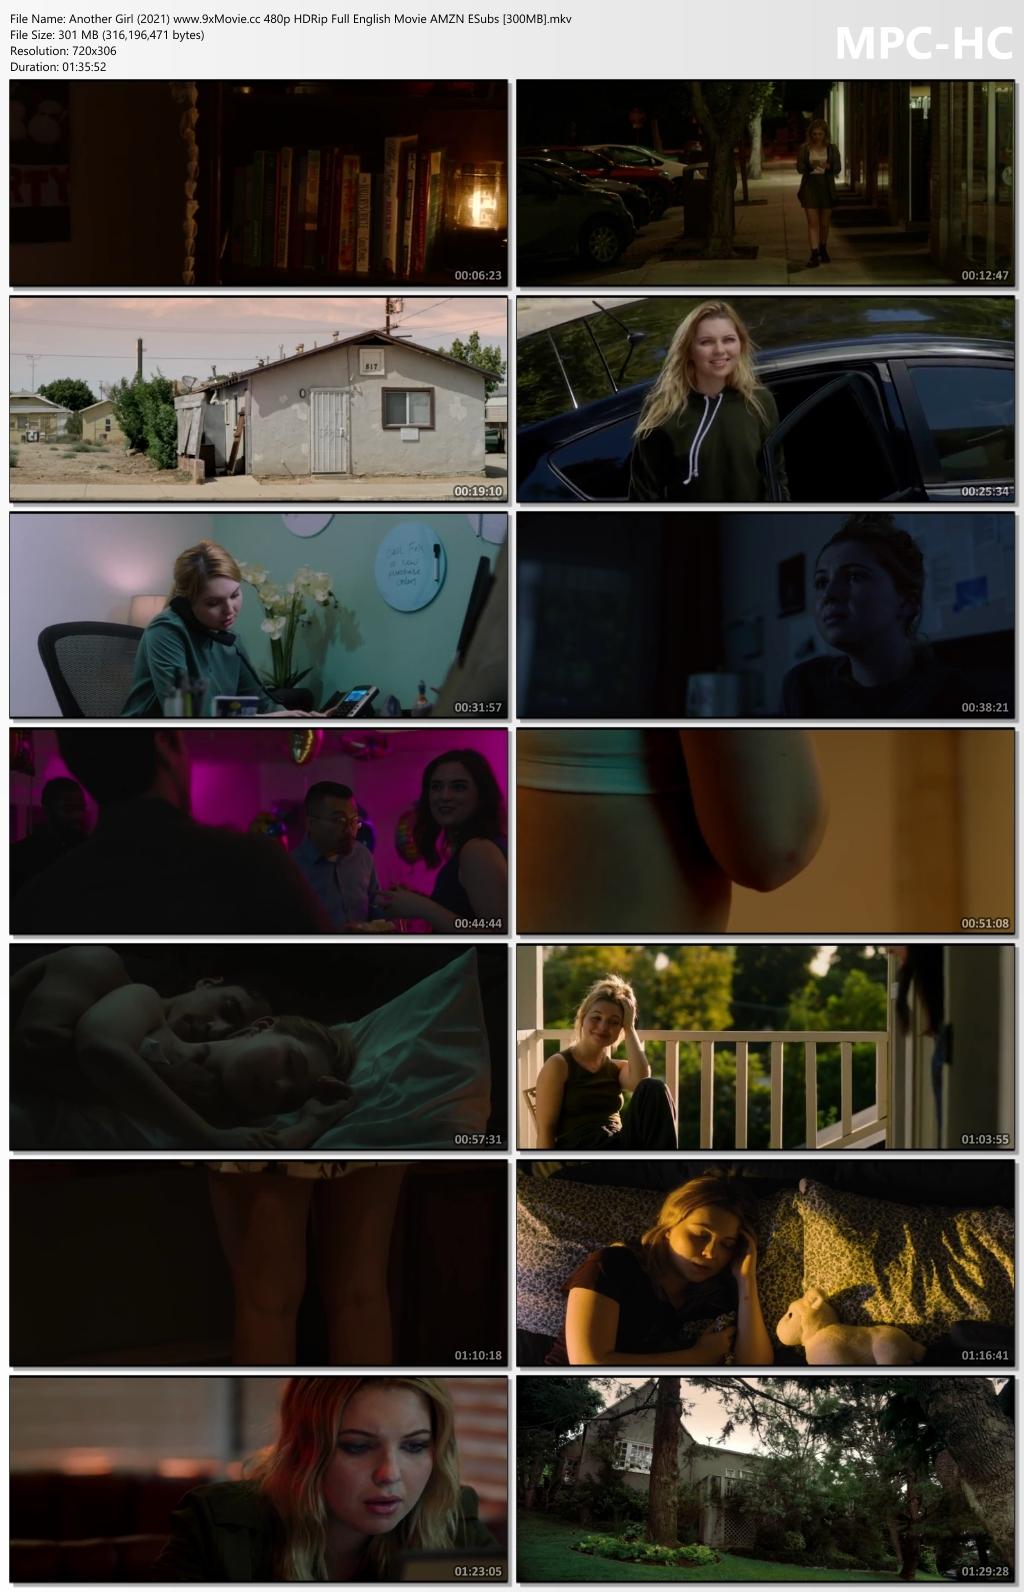 Another-Girl-2021-www-9x-Movie-cc-480p-HDRip-Full-English-Movie-AMZN-ESubs-300-MB-mkv